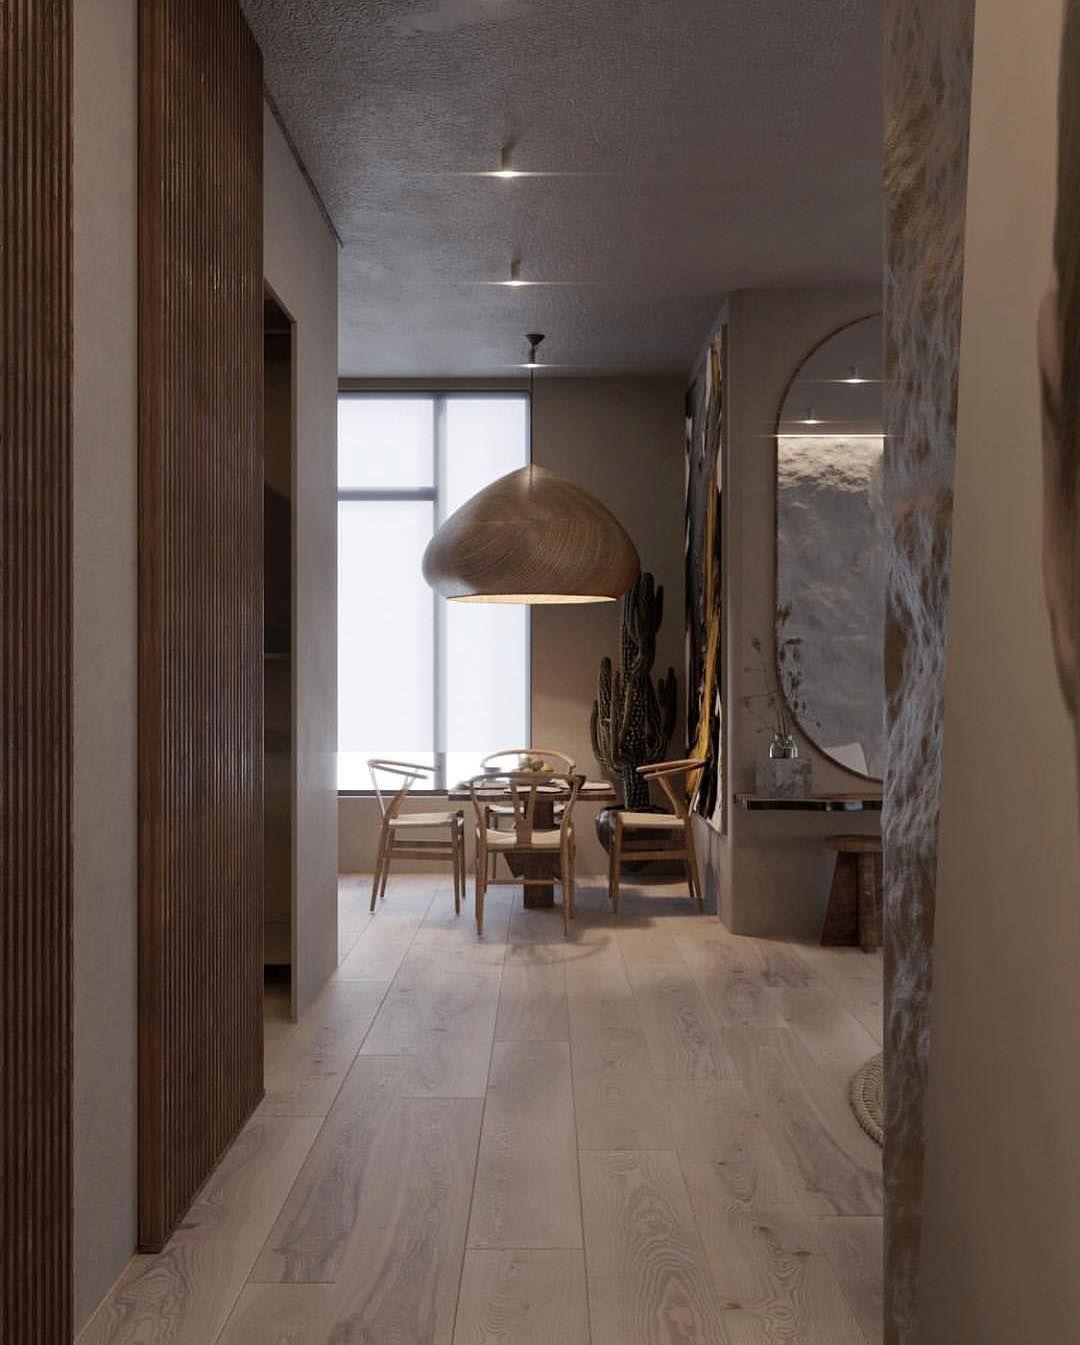 Fascinating 27 Beegcom Home Decor Business Card Design In 2020 Home Decor Bedroom Best Interior Design House Design